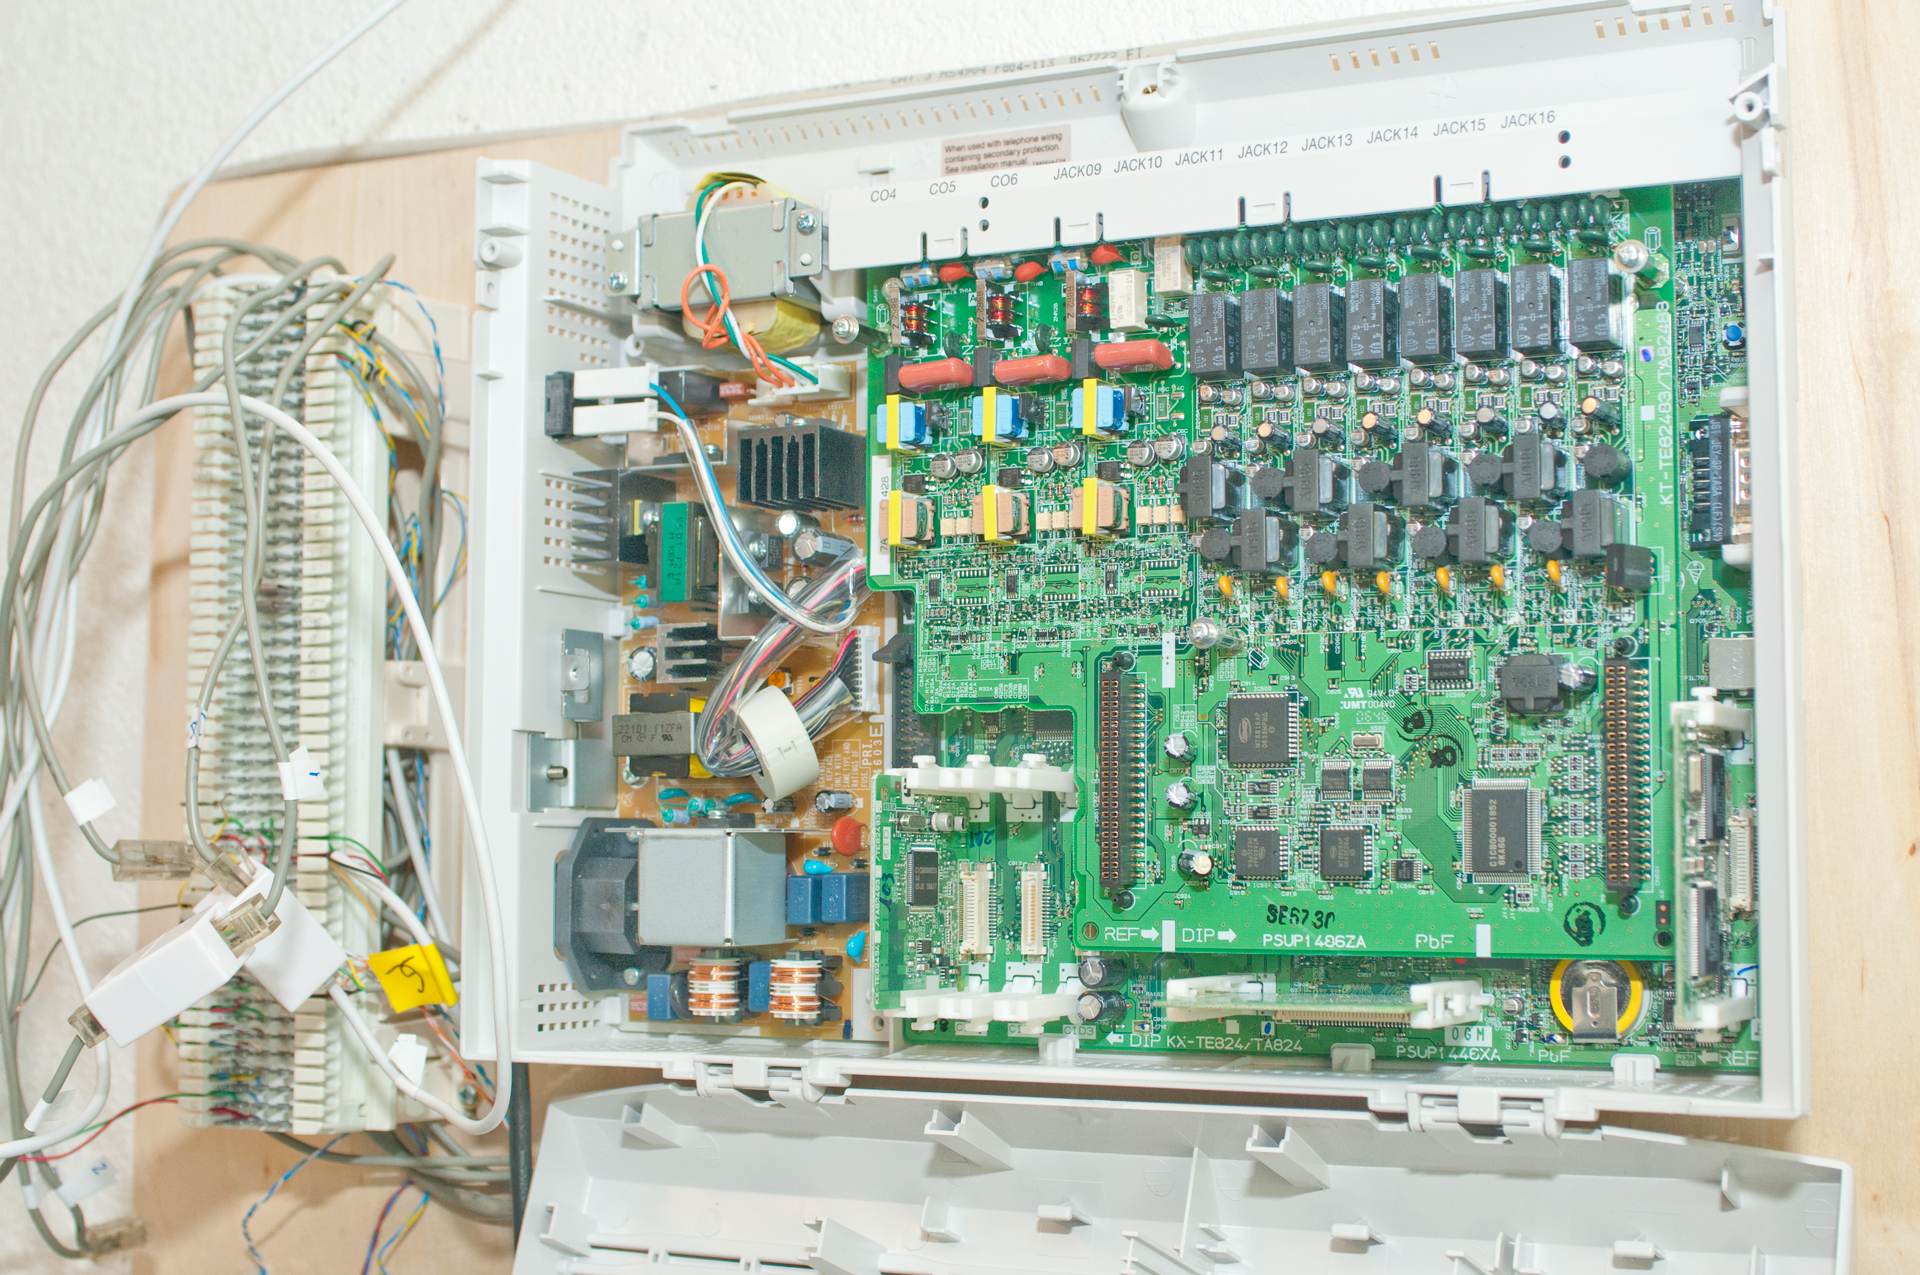 Rj 45 Socket Wiring Diagram Panasonic Kx Ta824 Telephone System